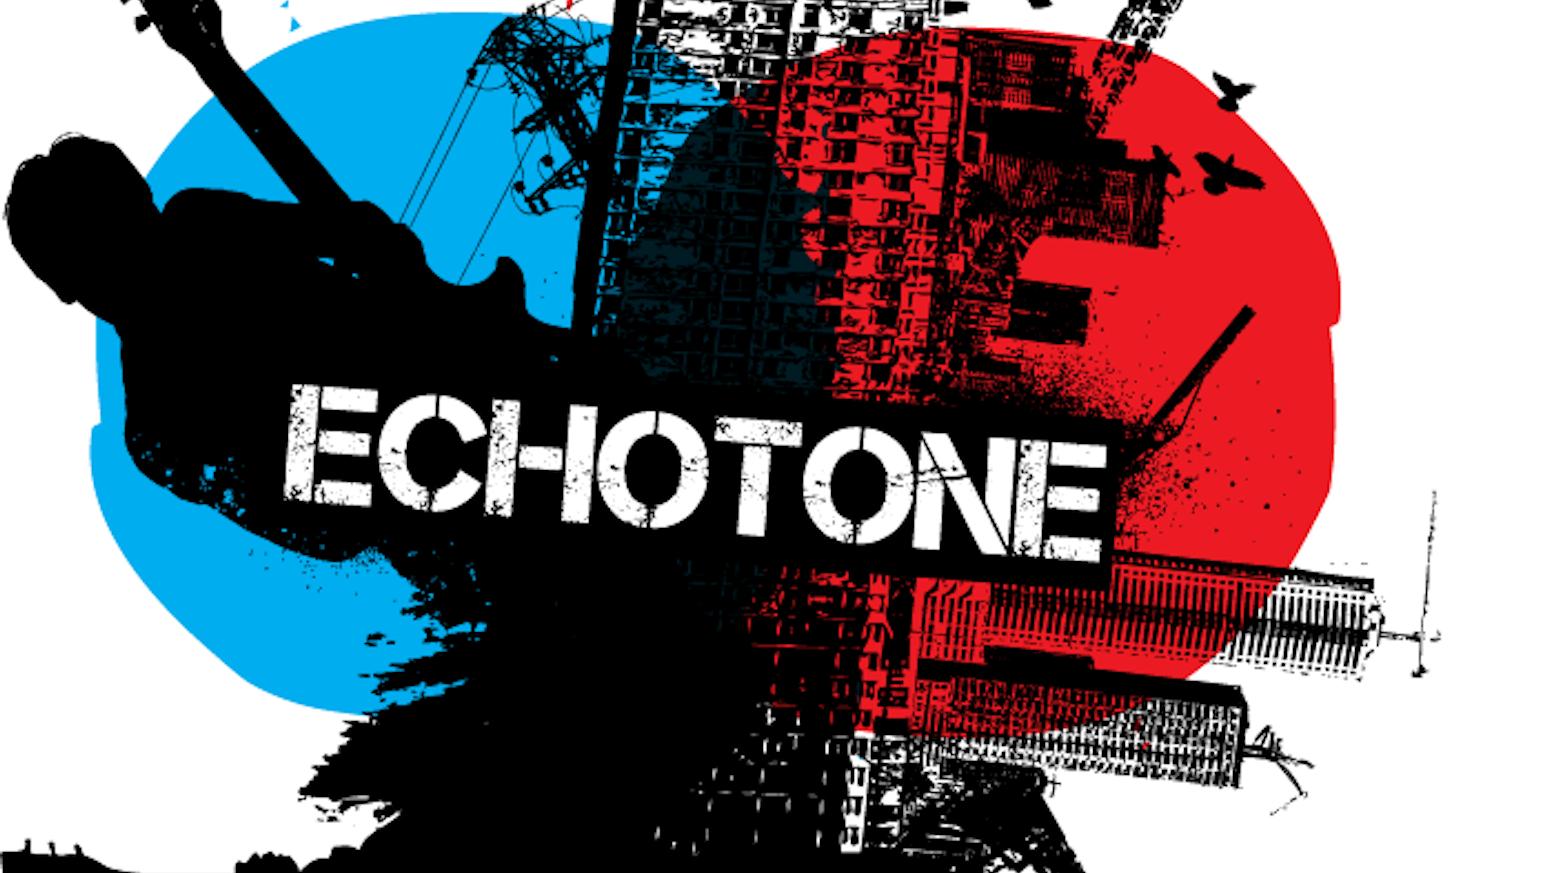 Let a Rock Doc Rock! Help launch Echotone! by The Dark